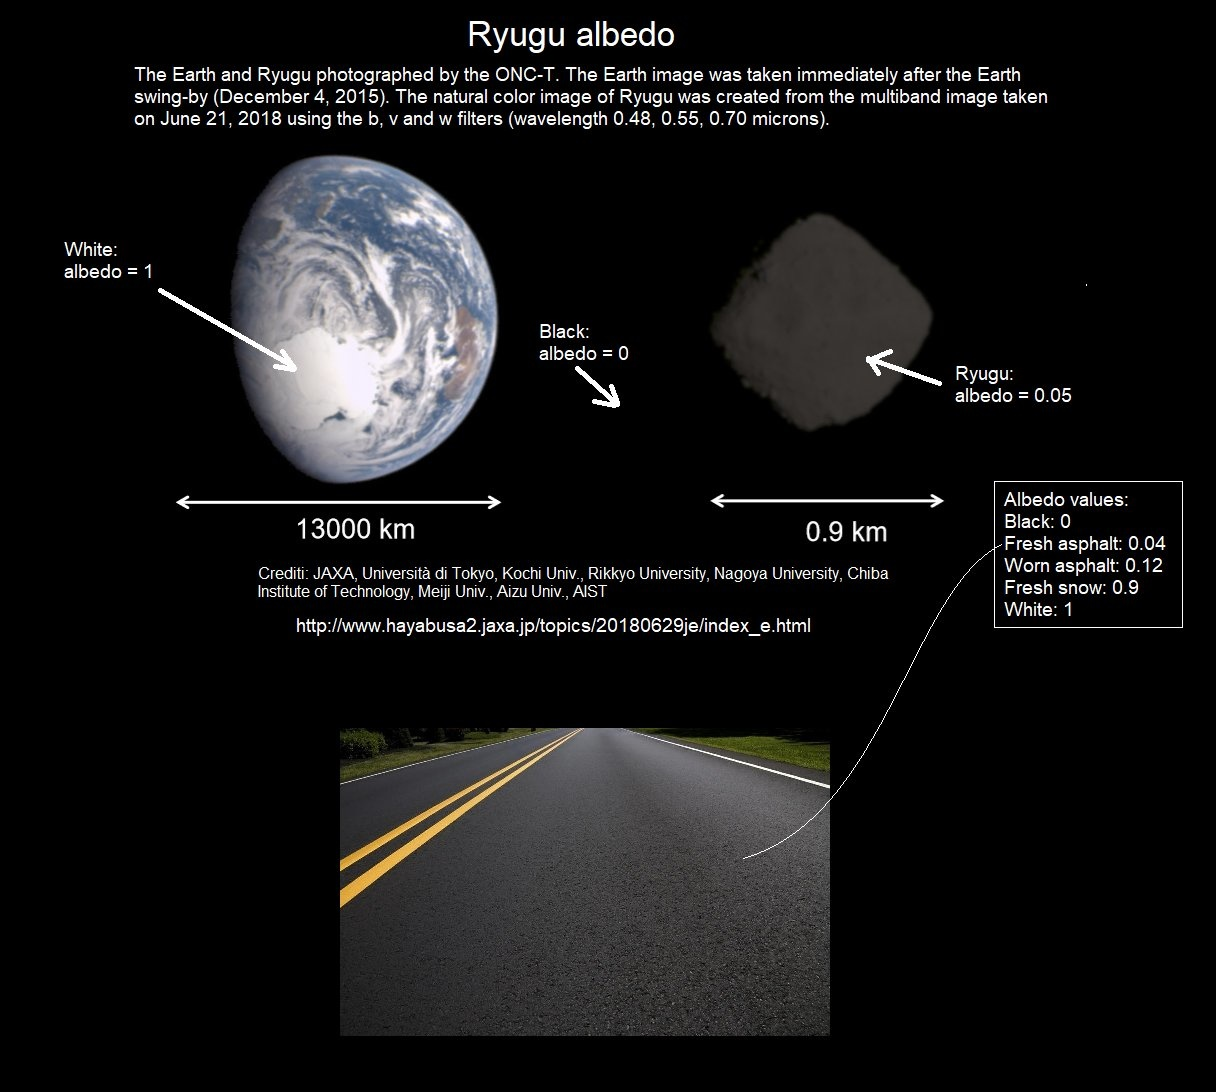 ryugu-albedo.jpg.a8c6aeb203d6bc39edc1057919850352.jpg